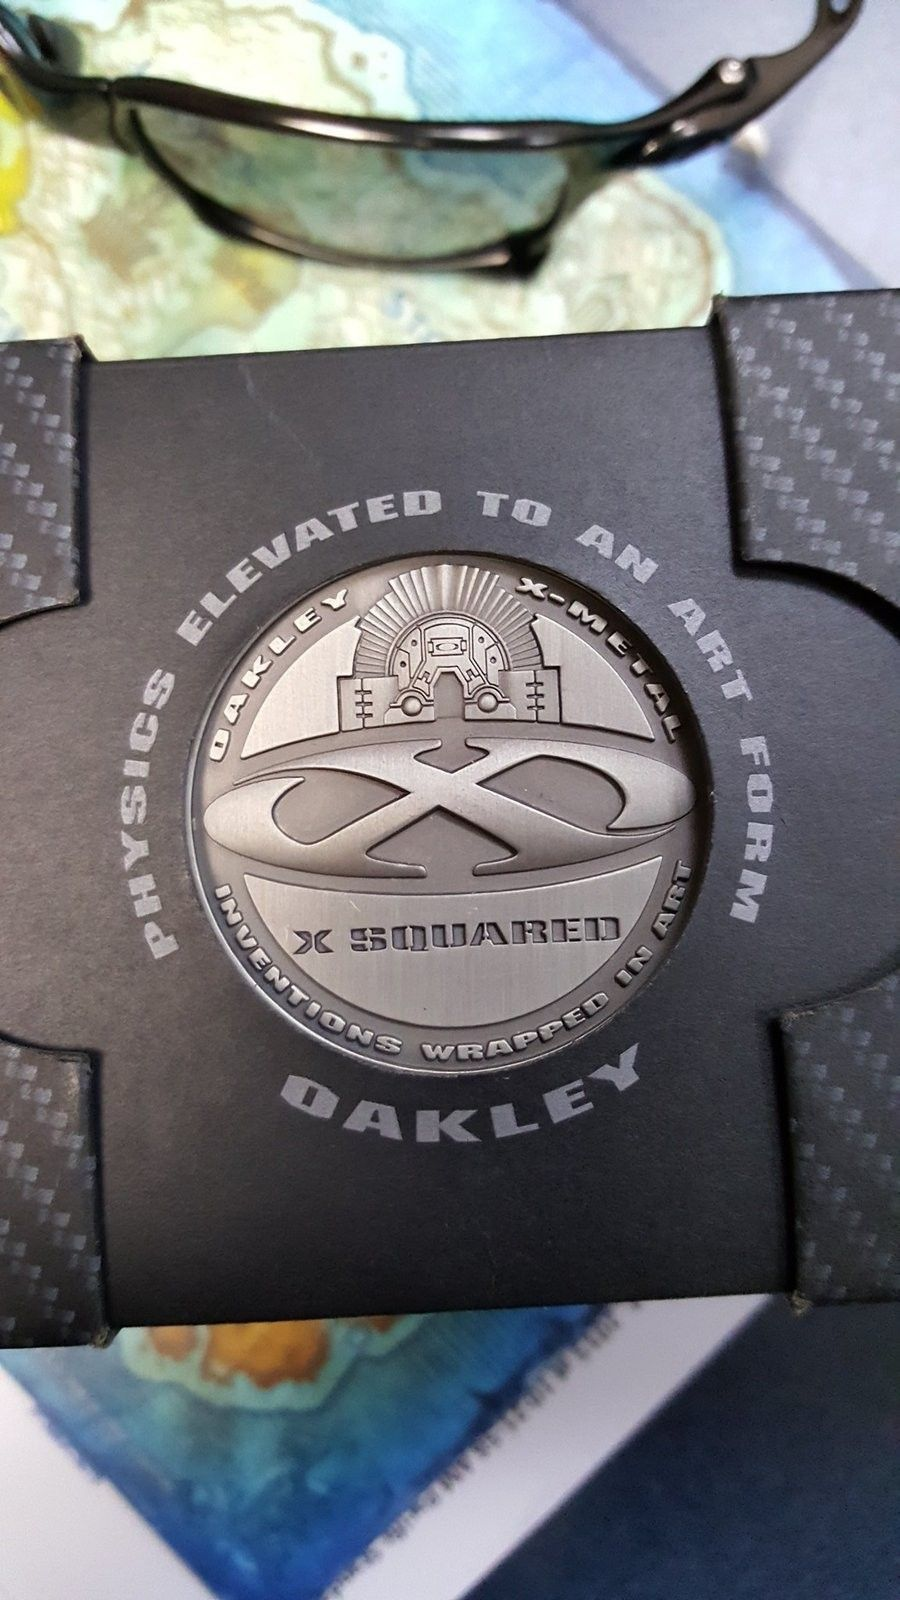 Like New - Xm X Squared +Xmas Bonus Lenses- 475.00 Shipped/All - 20151211_090136.jpg